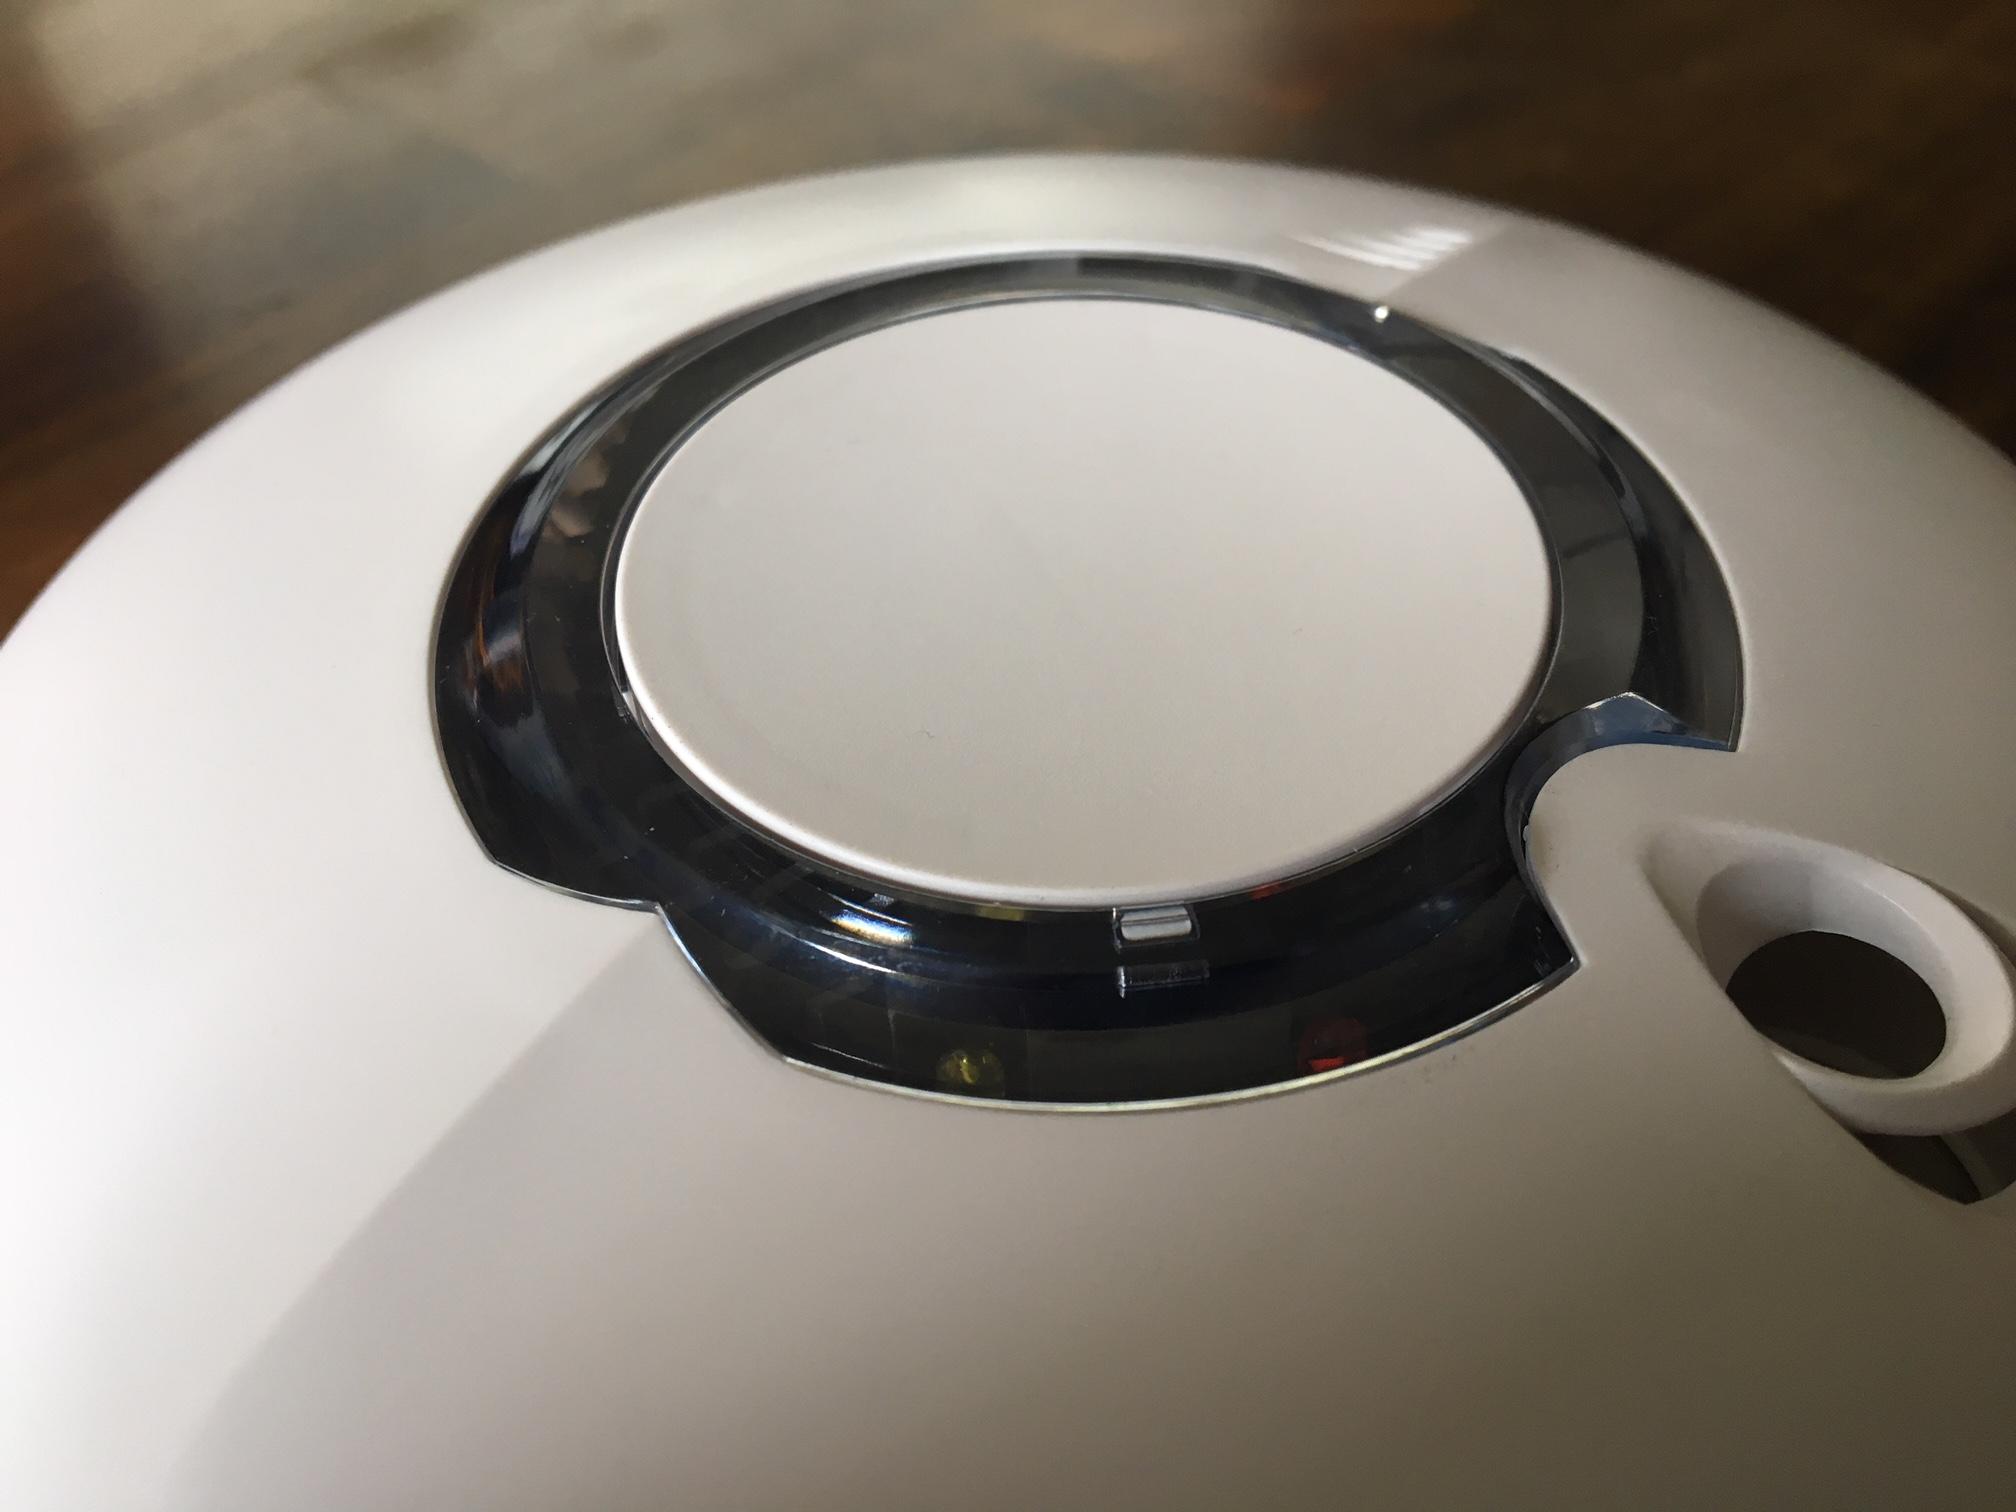 st630 p line testtaste rauchmelder experten. Black Bedroom Furniture Sets. Home Design Ideas